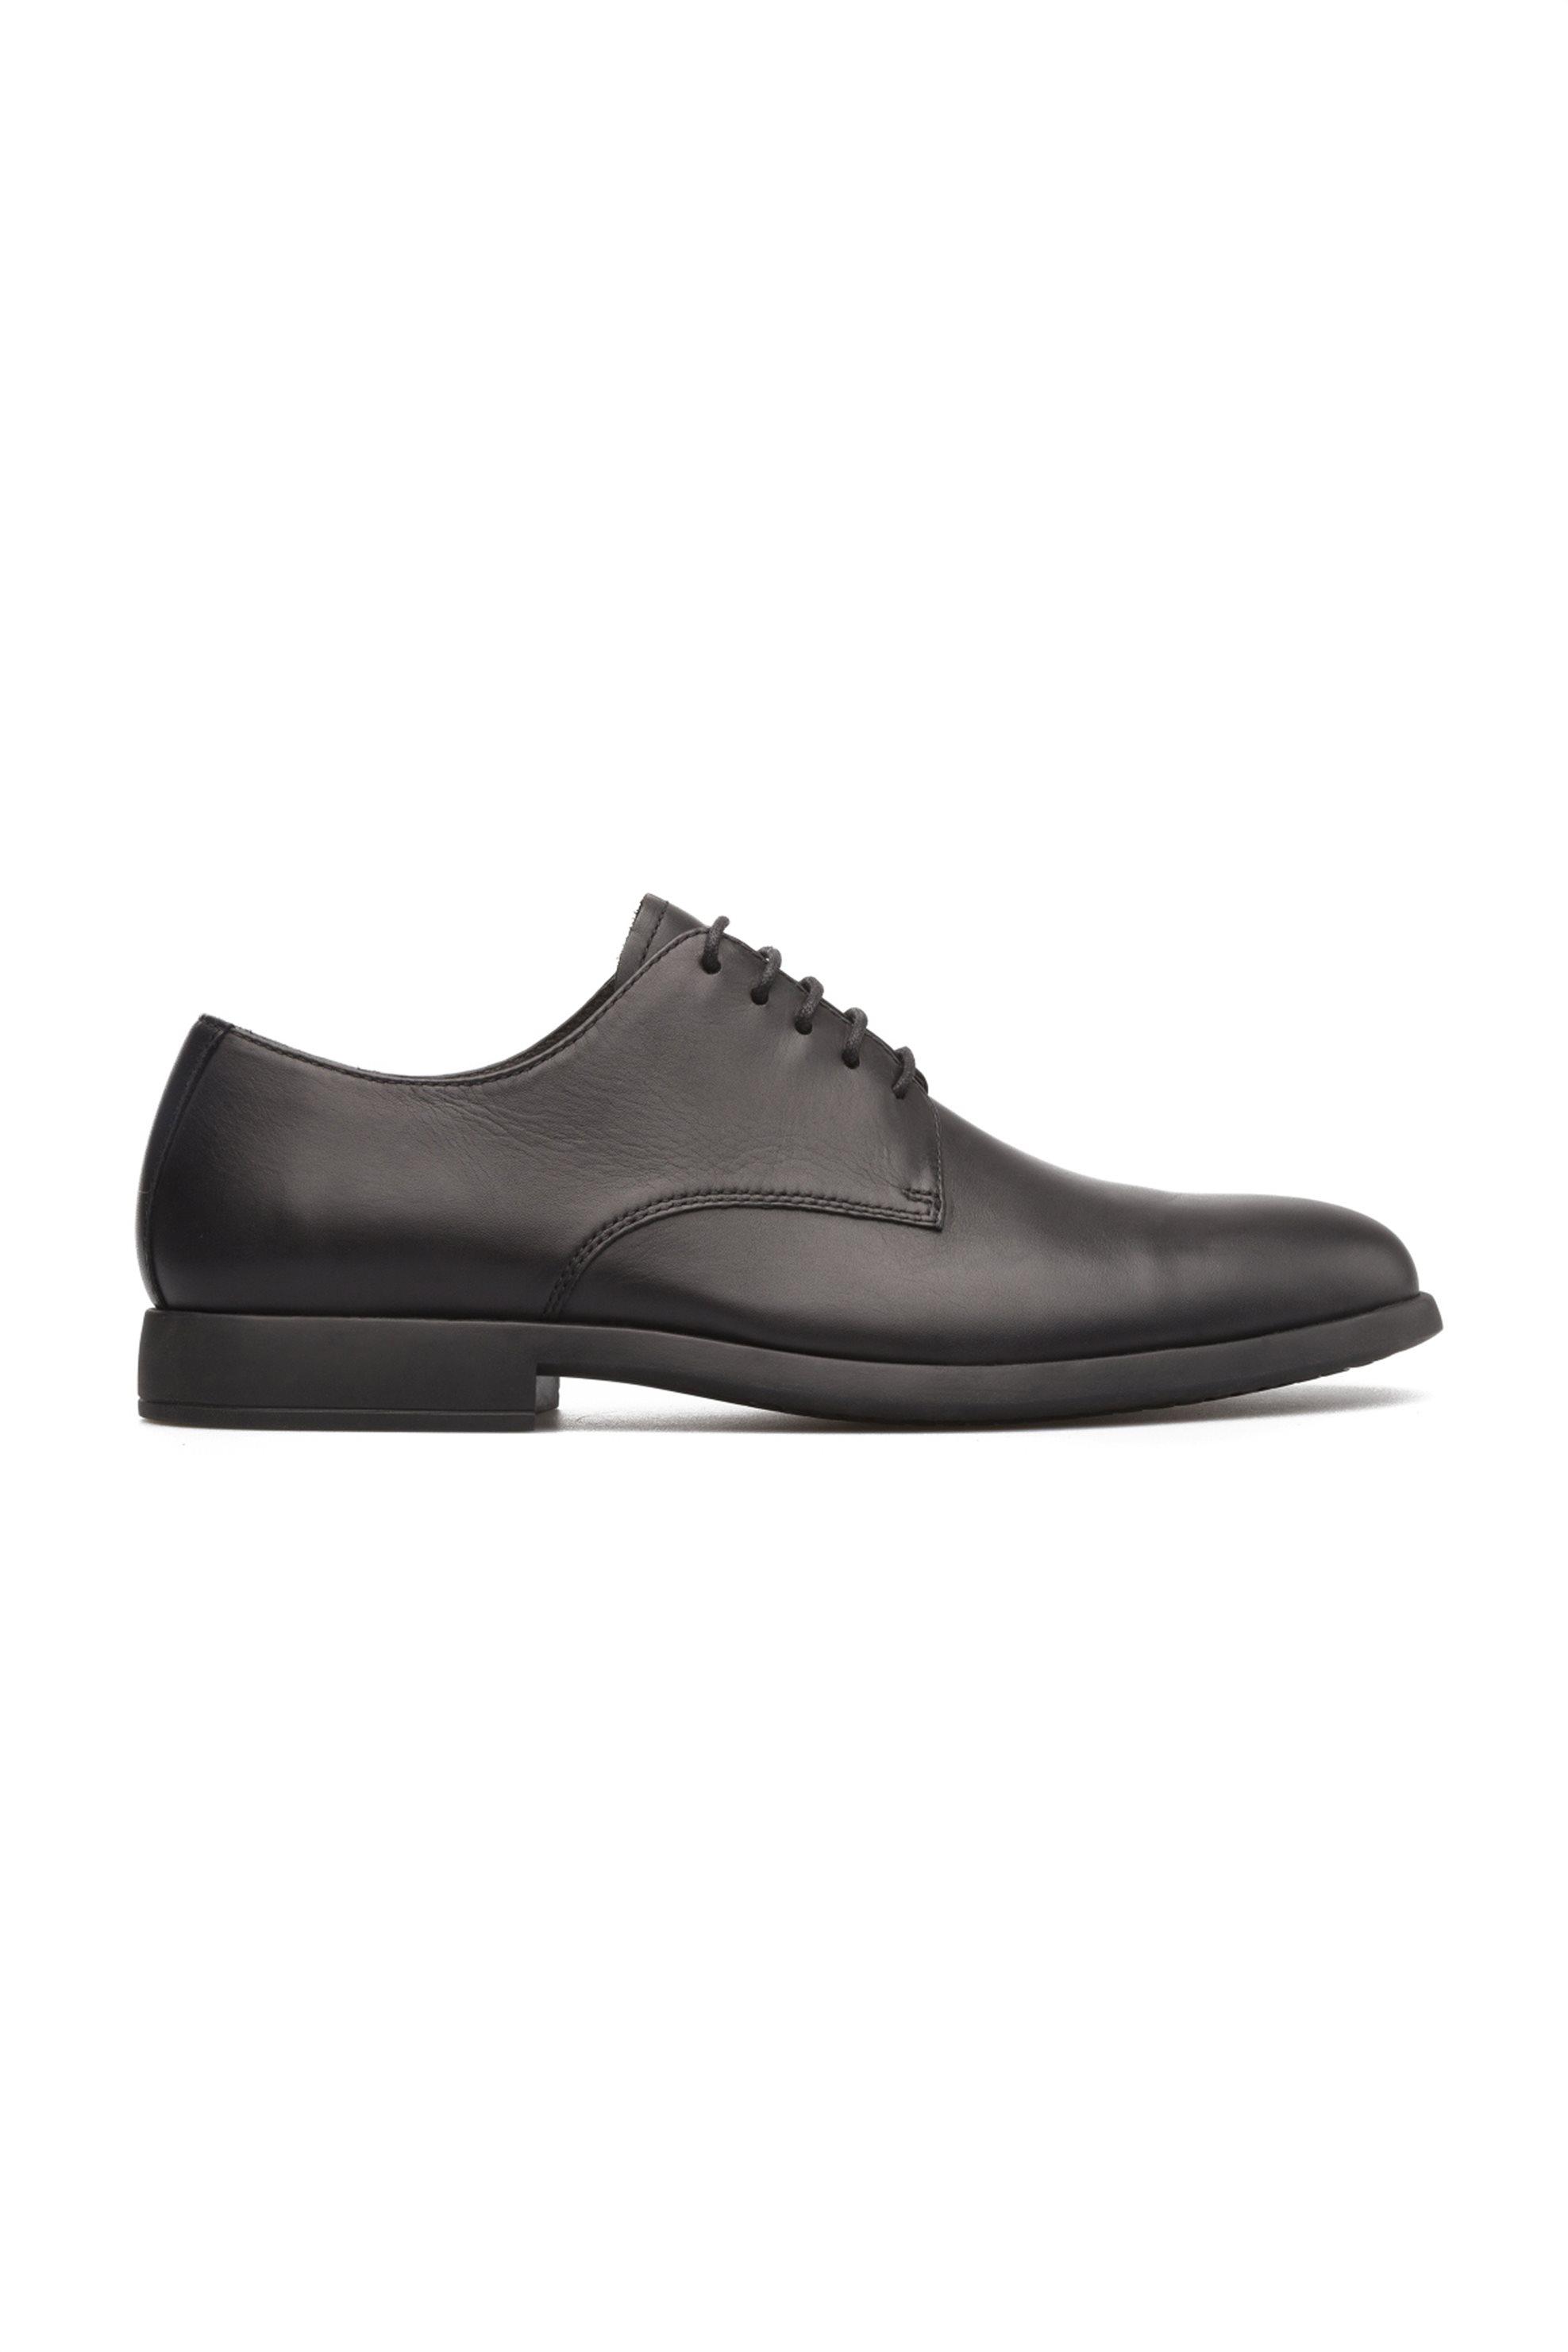 Camper ανδρικά παπούτσια Oxford Truman – K100243-001 – Μαύρο